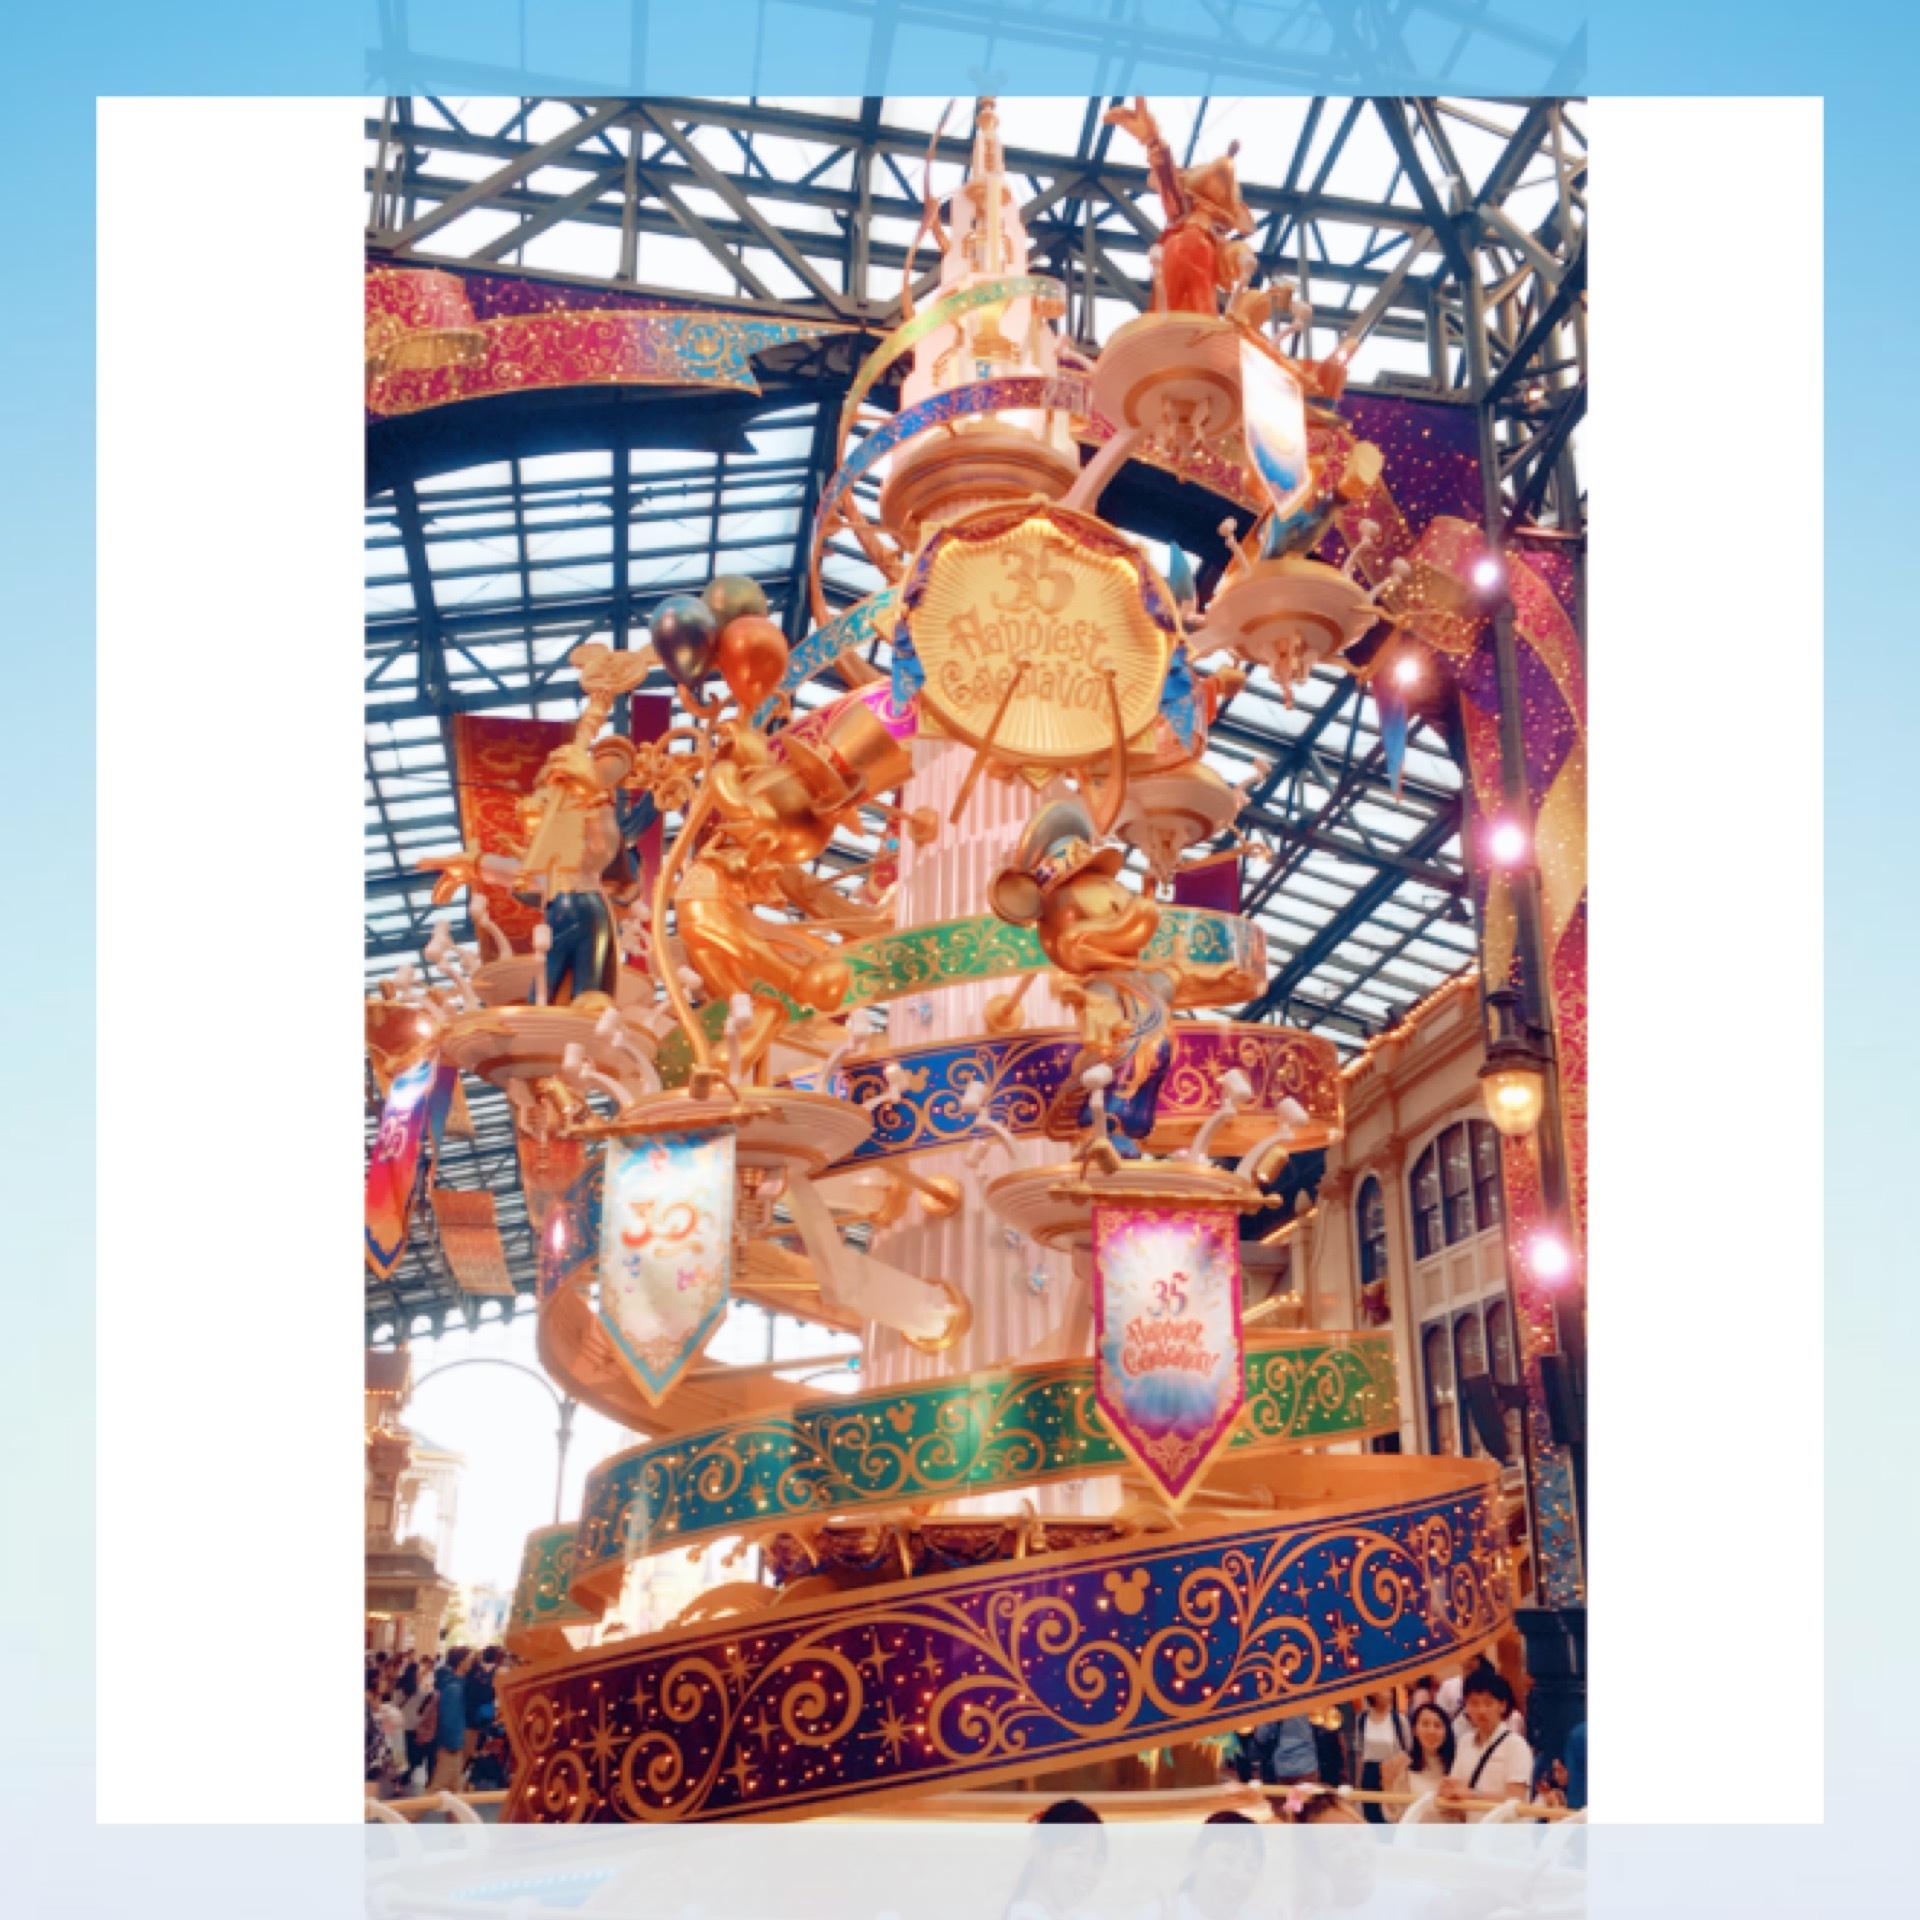 Tokyo Disneyland《 35 Happiest Gelebration! 》に行ってきました♫_1_3-1